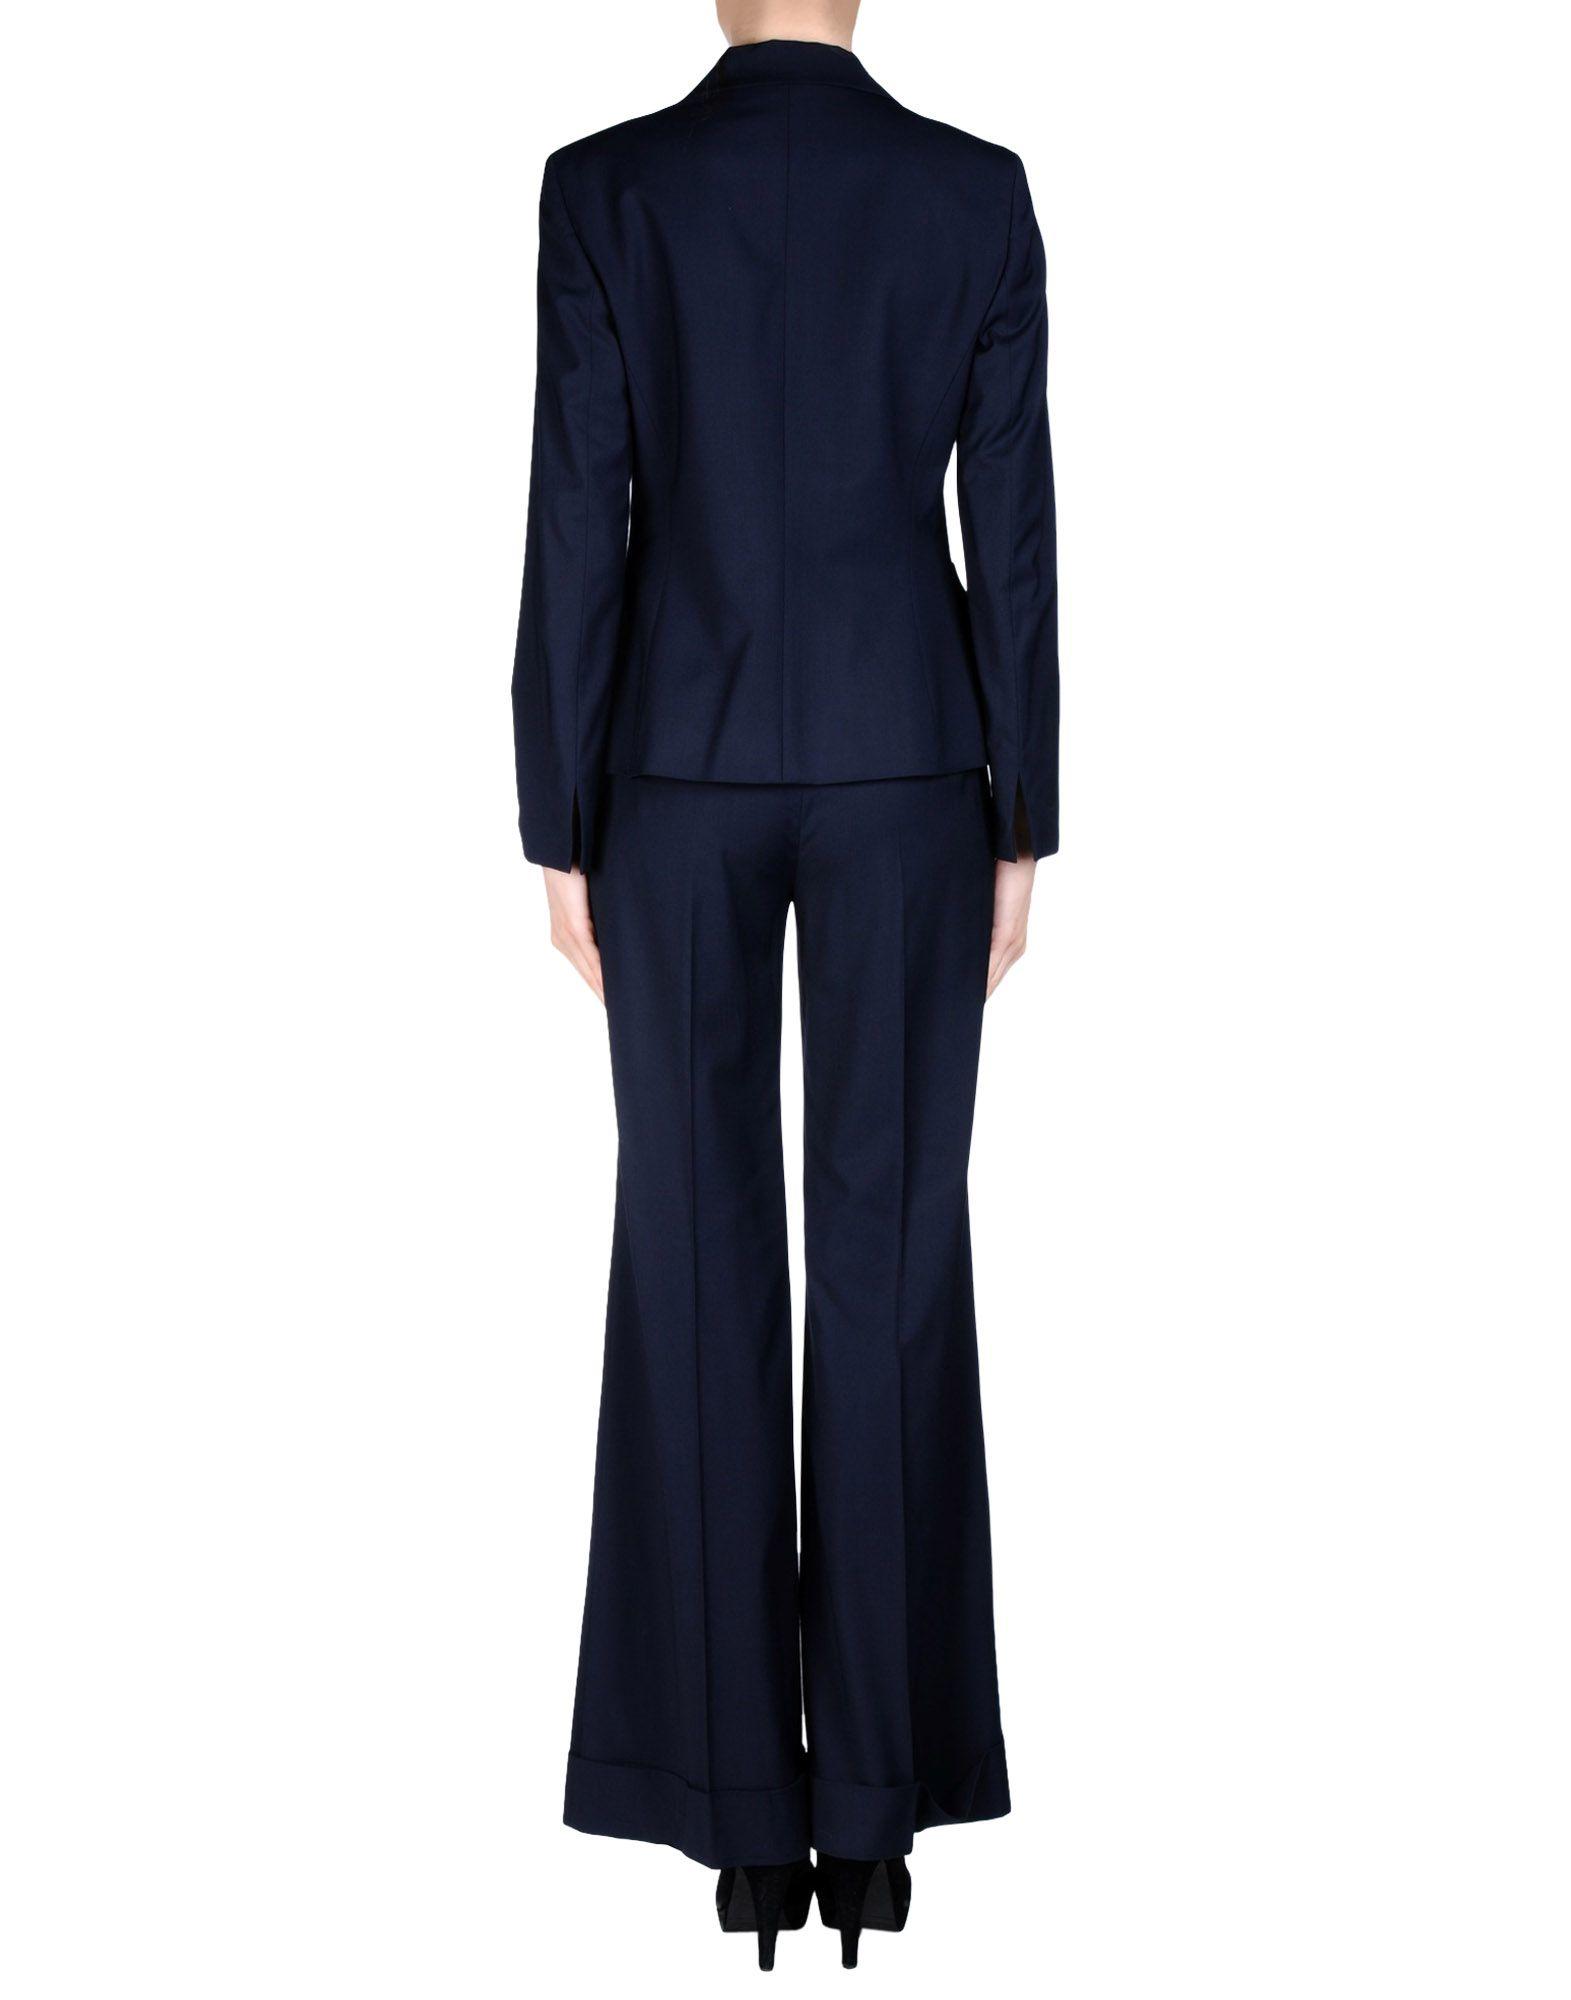 M Missoni Women S Suit In Blue Lyst